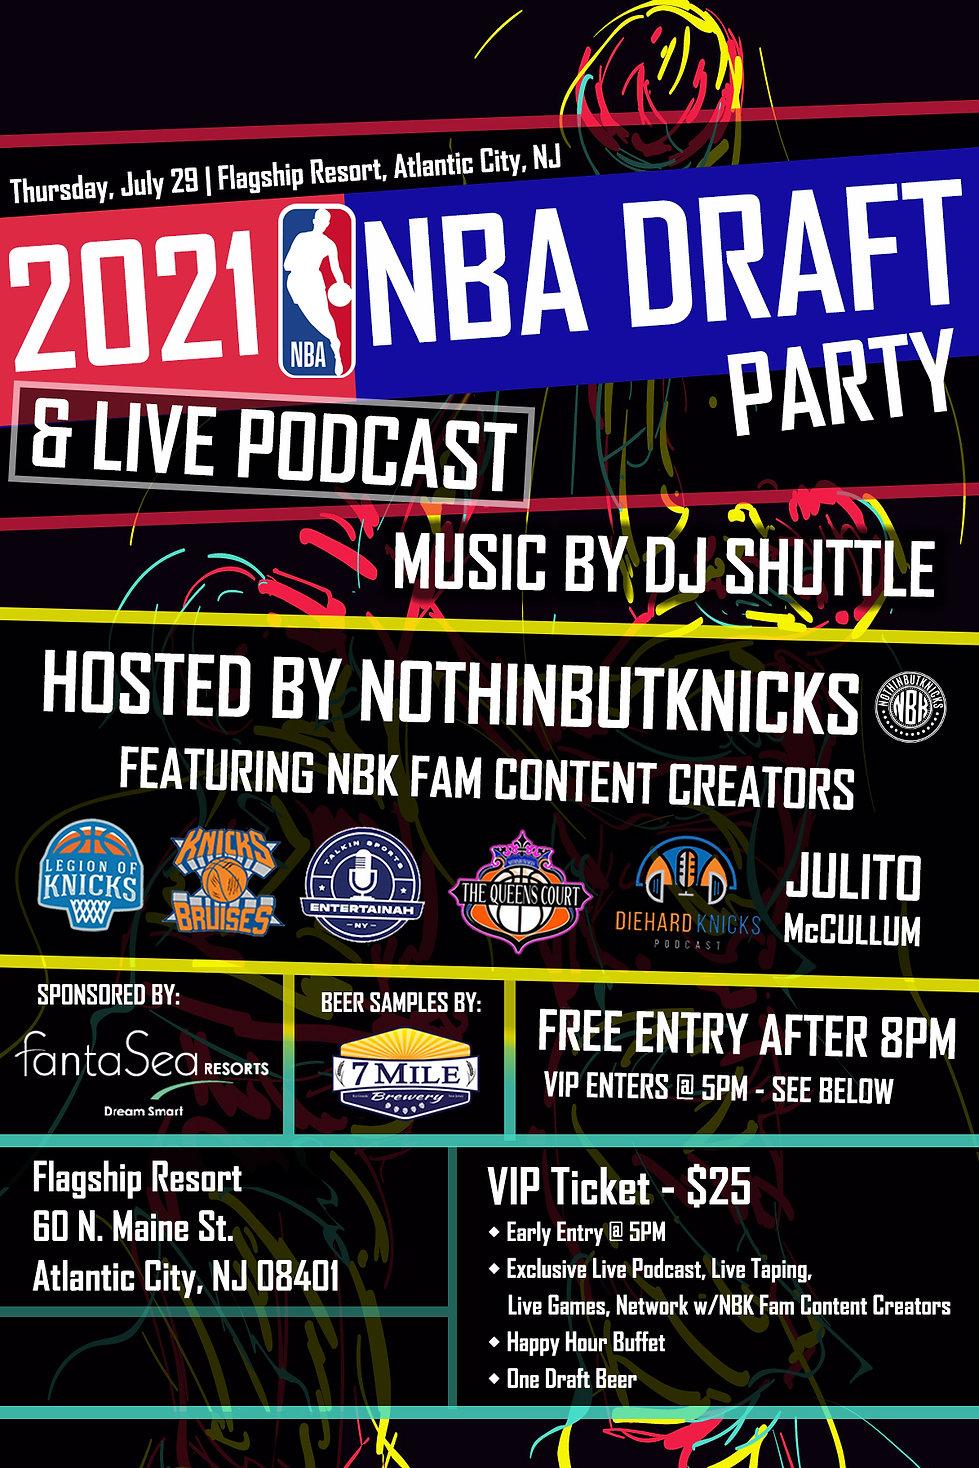 Draft Party Flyer wix.jpg